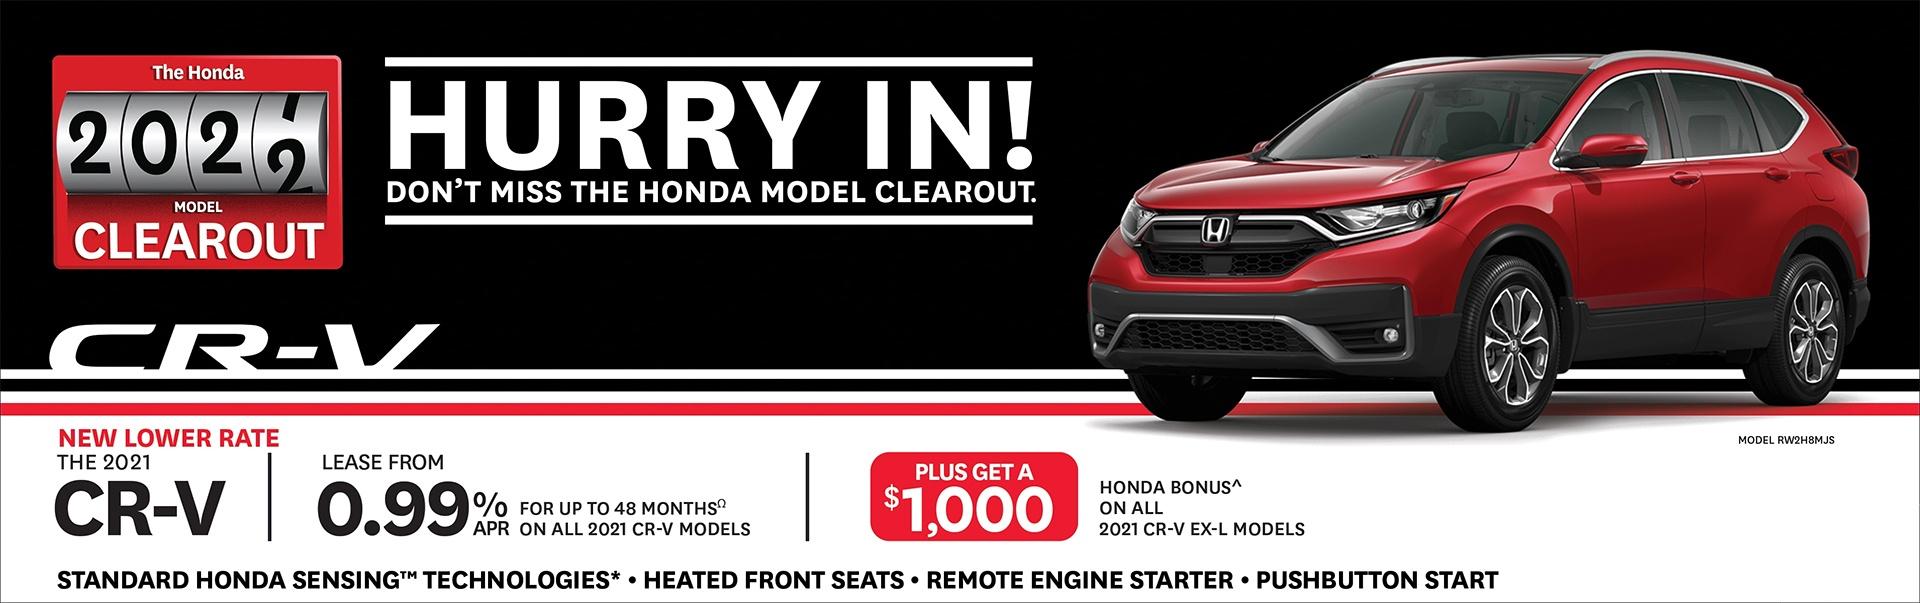 2021 Honda CRV Exterior at Richmond Hill Honda in Toronto and the GTA